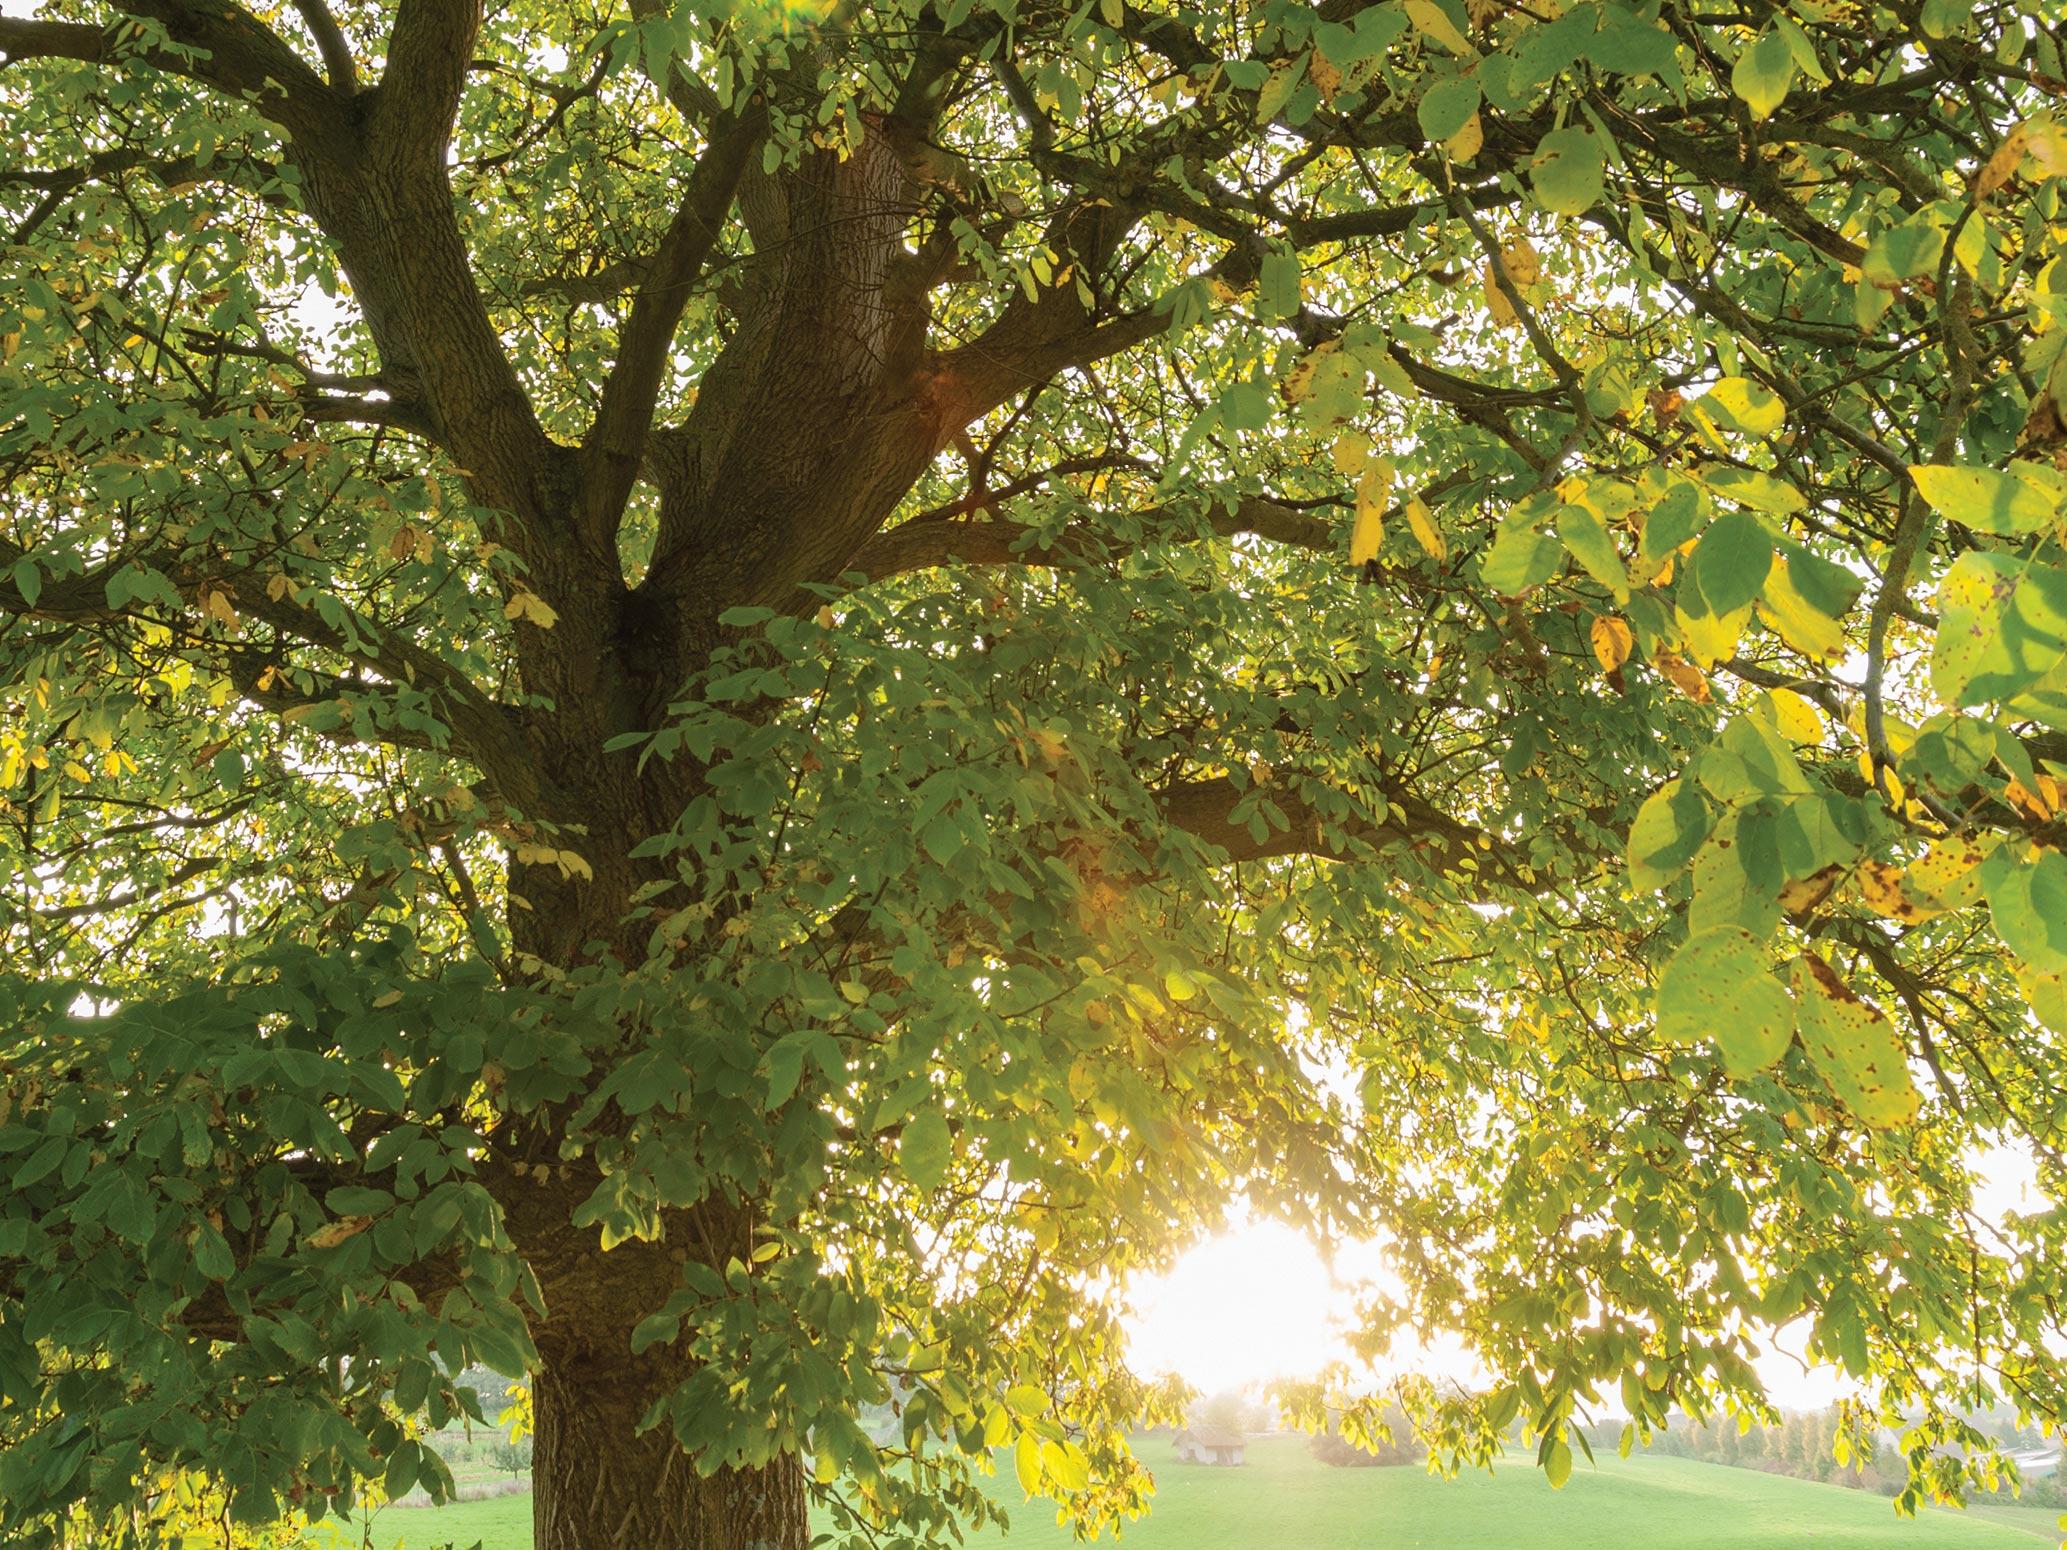 common walnut - Common Walnut